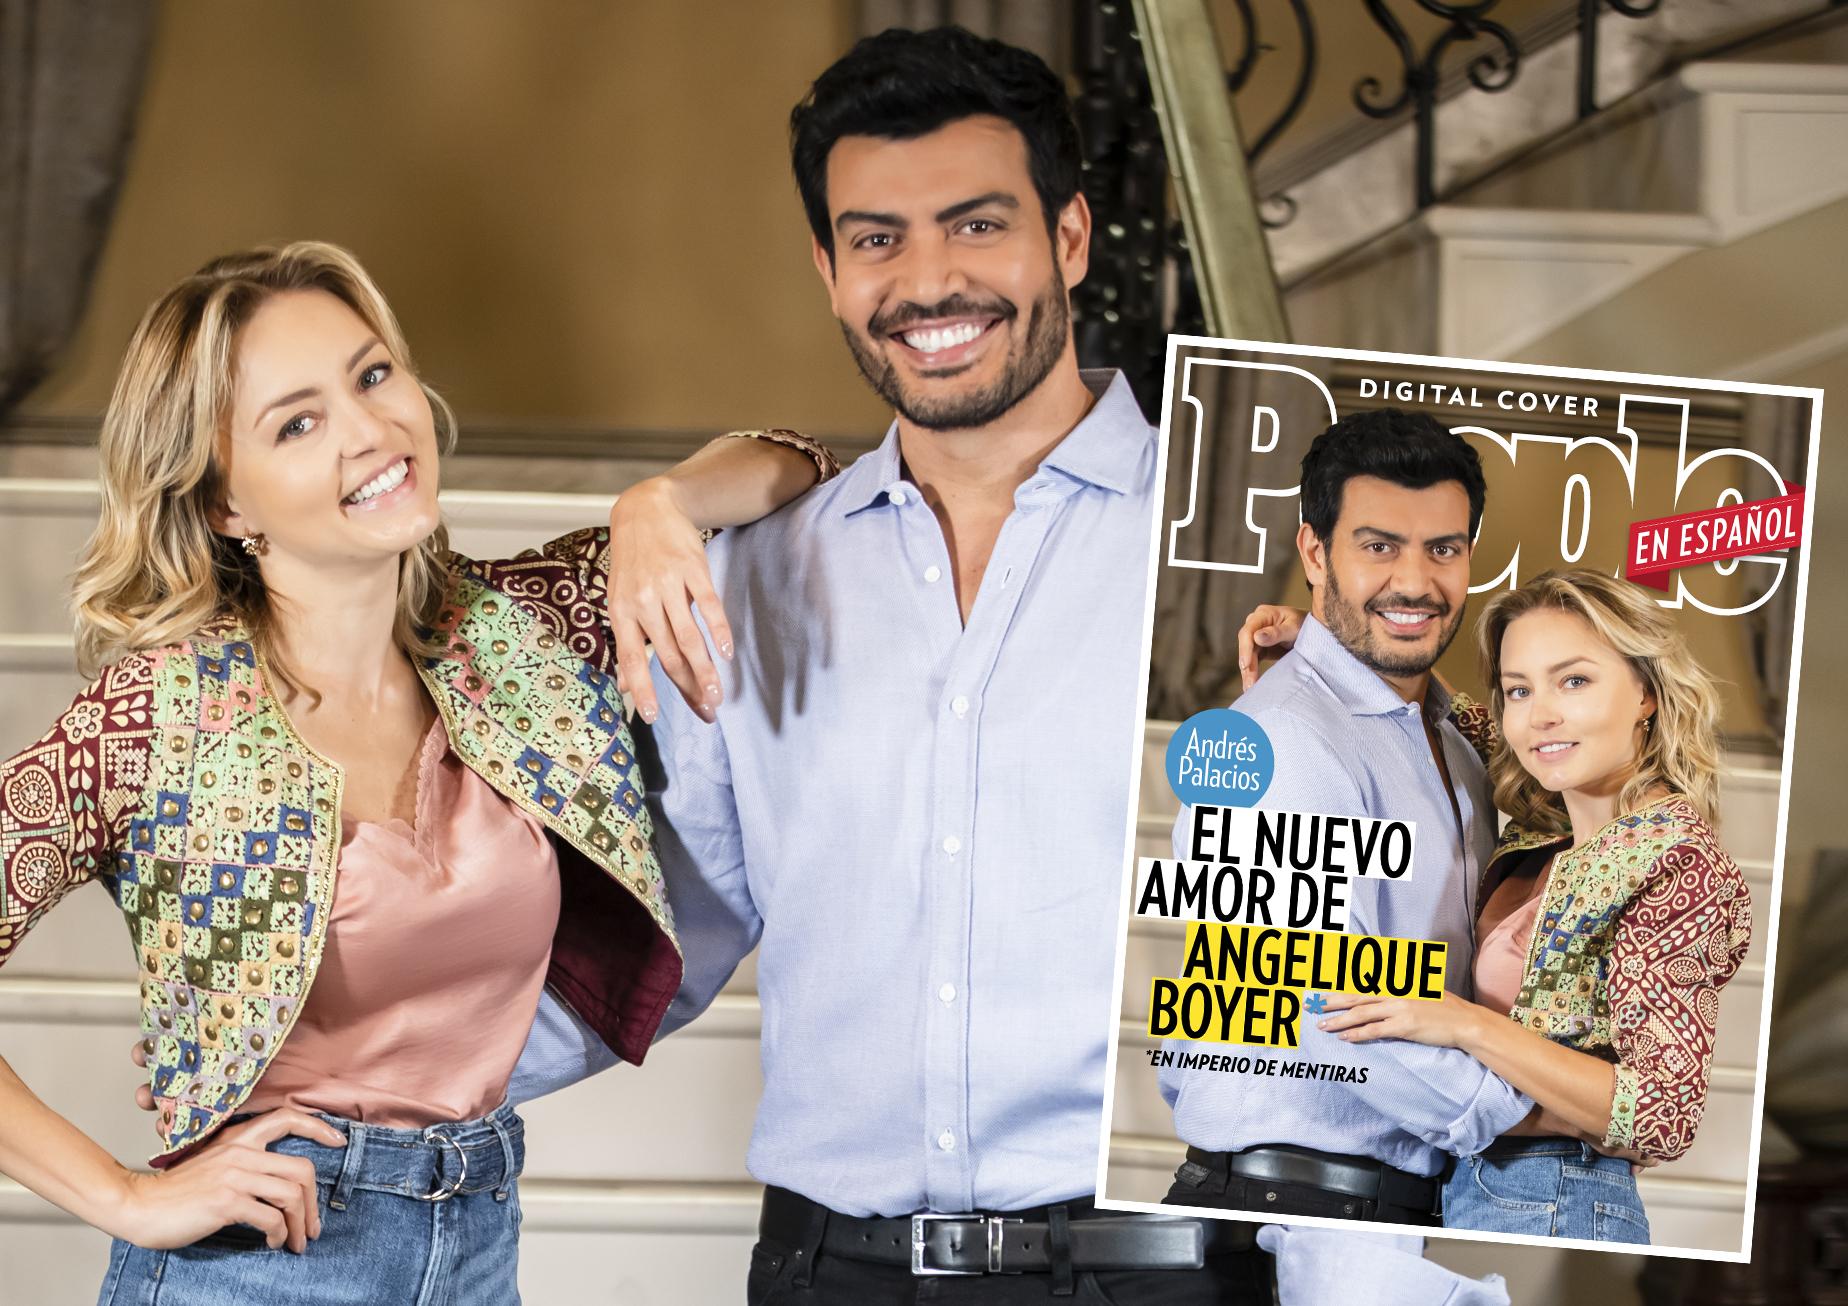 Angelique Boyer y Andres Palacios (DO NOT REUSE)